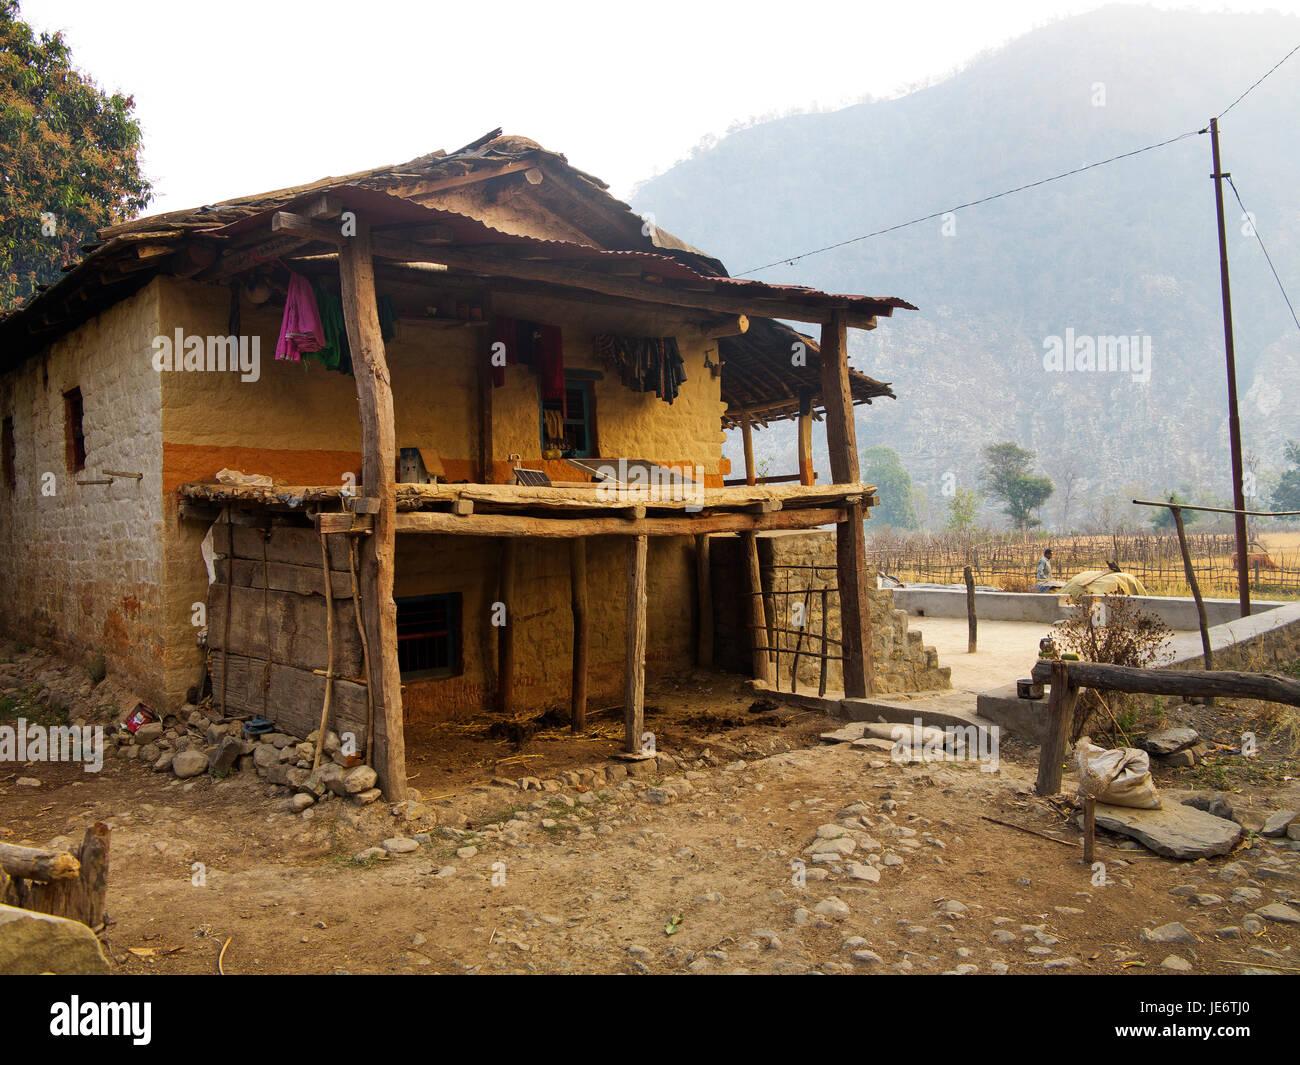 Simple House At Chuka Village On The Banks Of The Sarda River Made